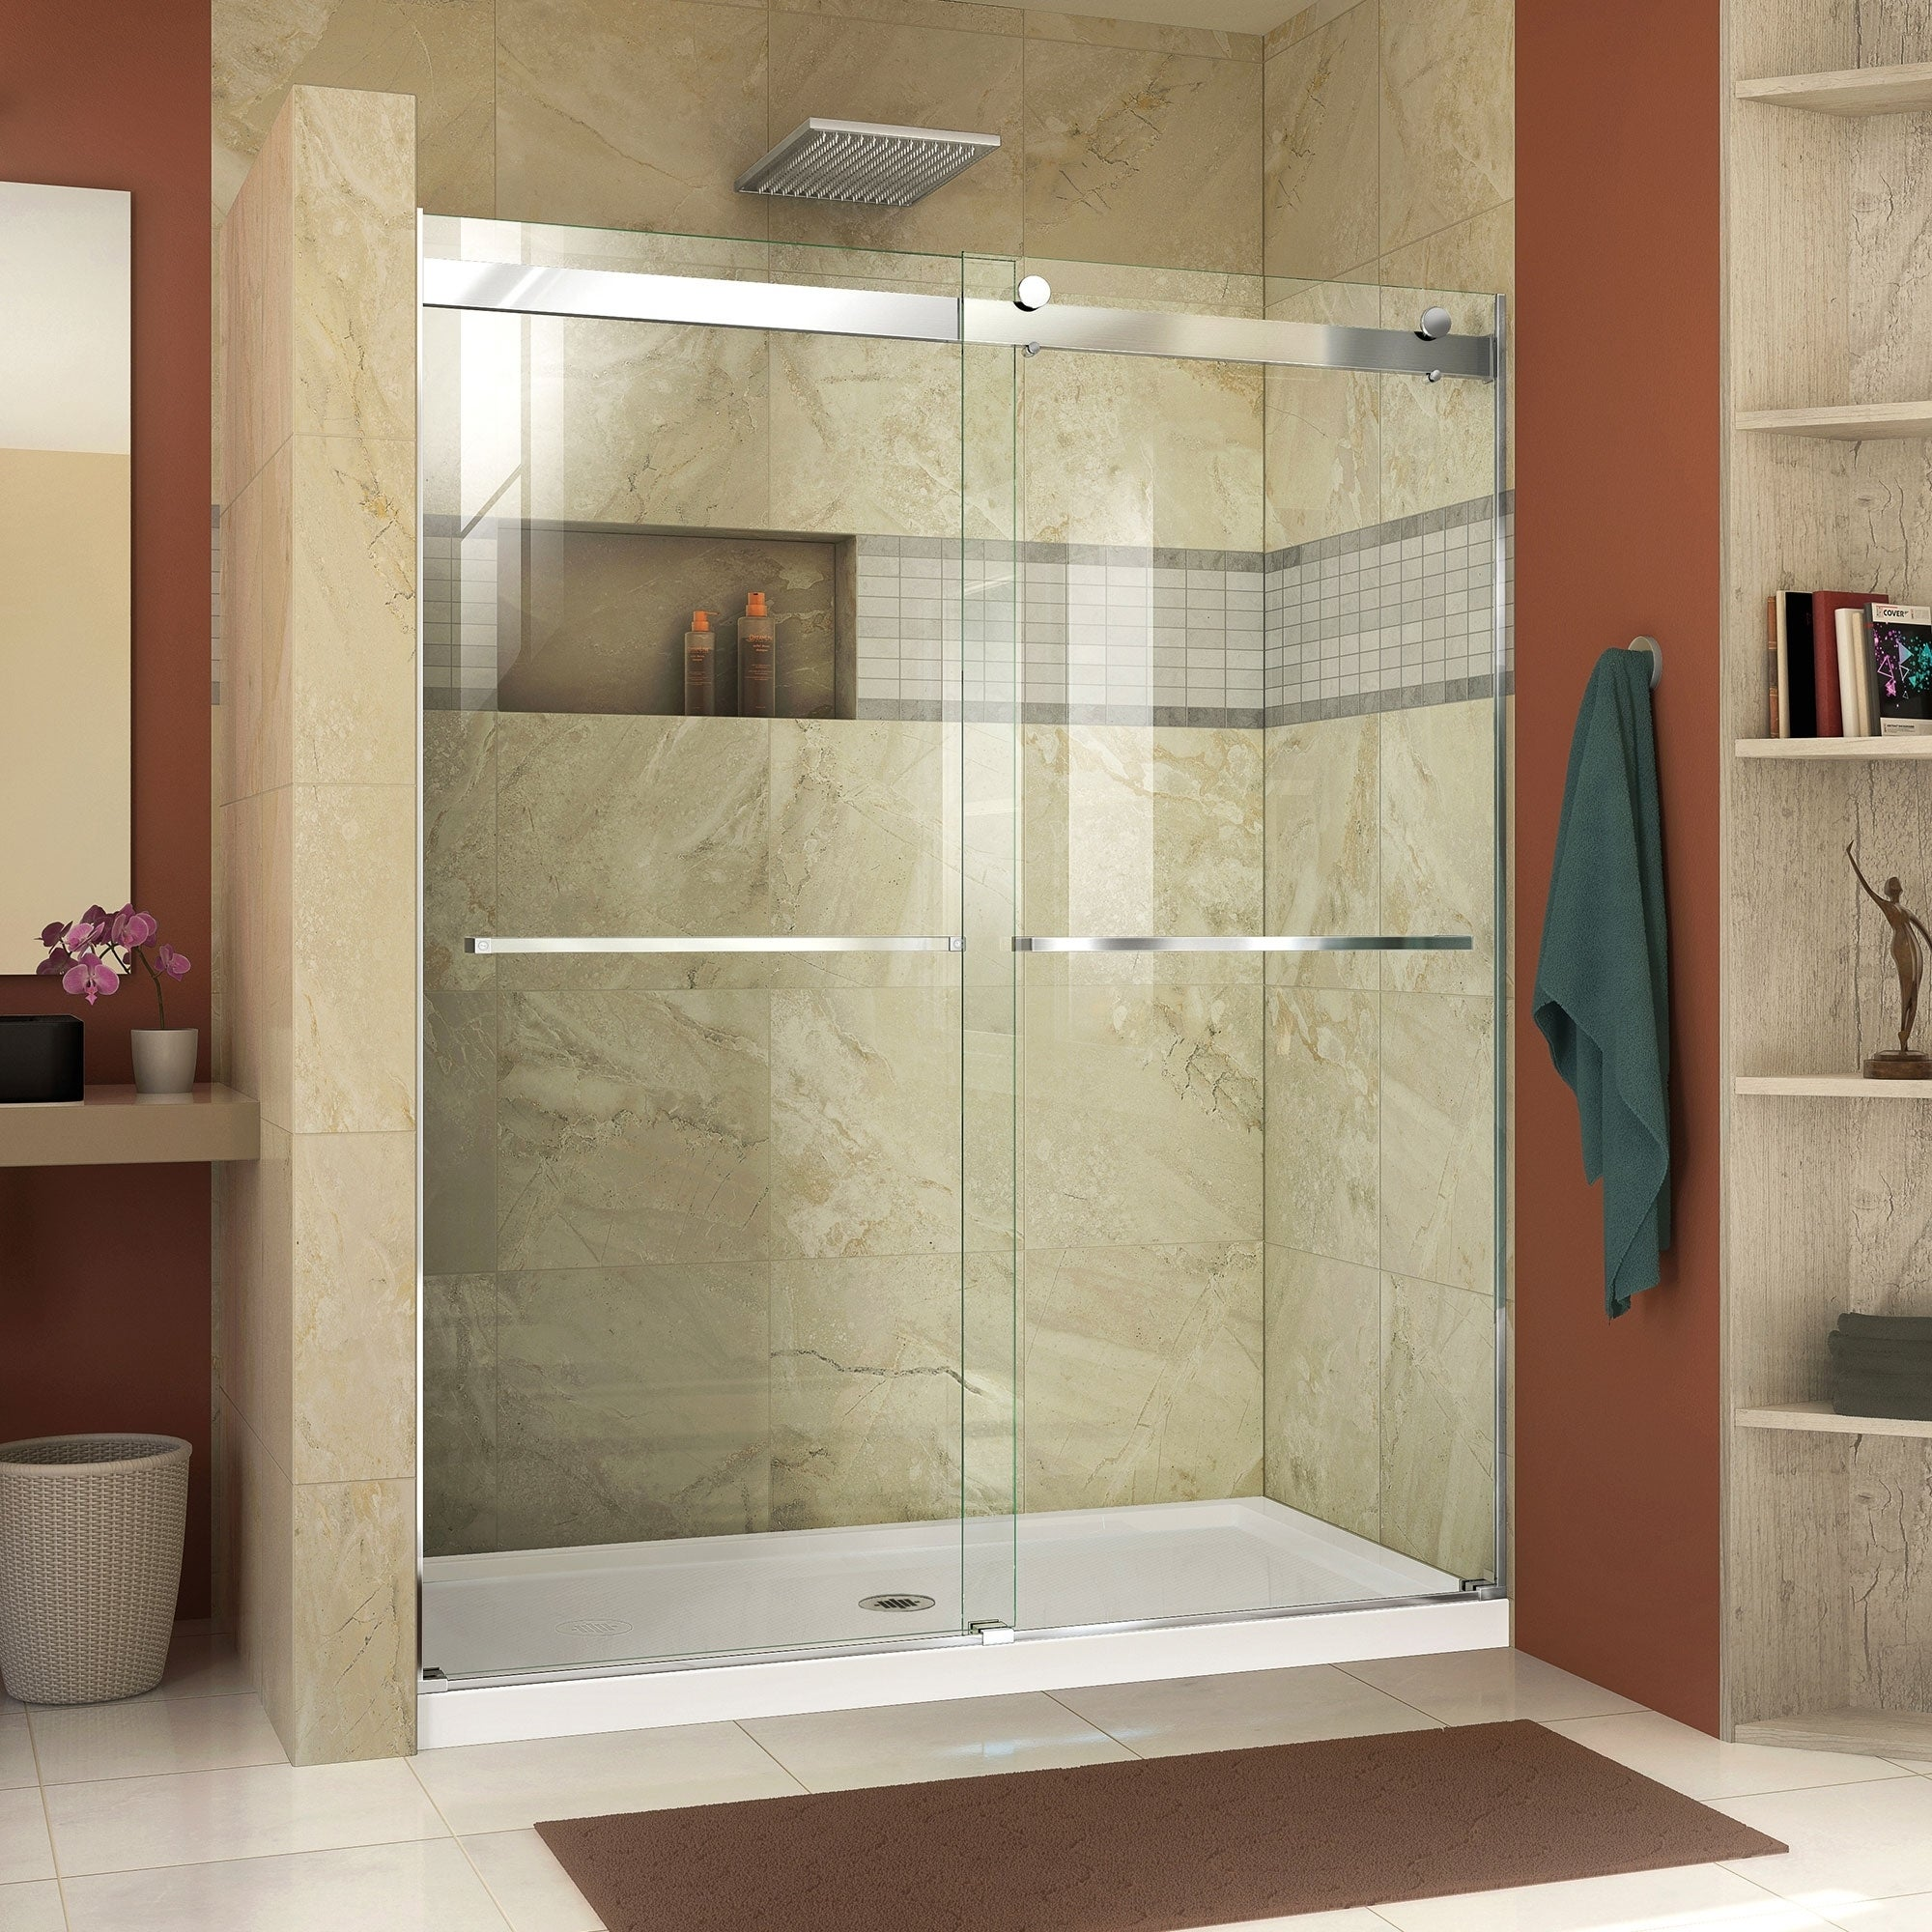 H Frameless Bypass Shower